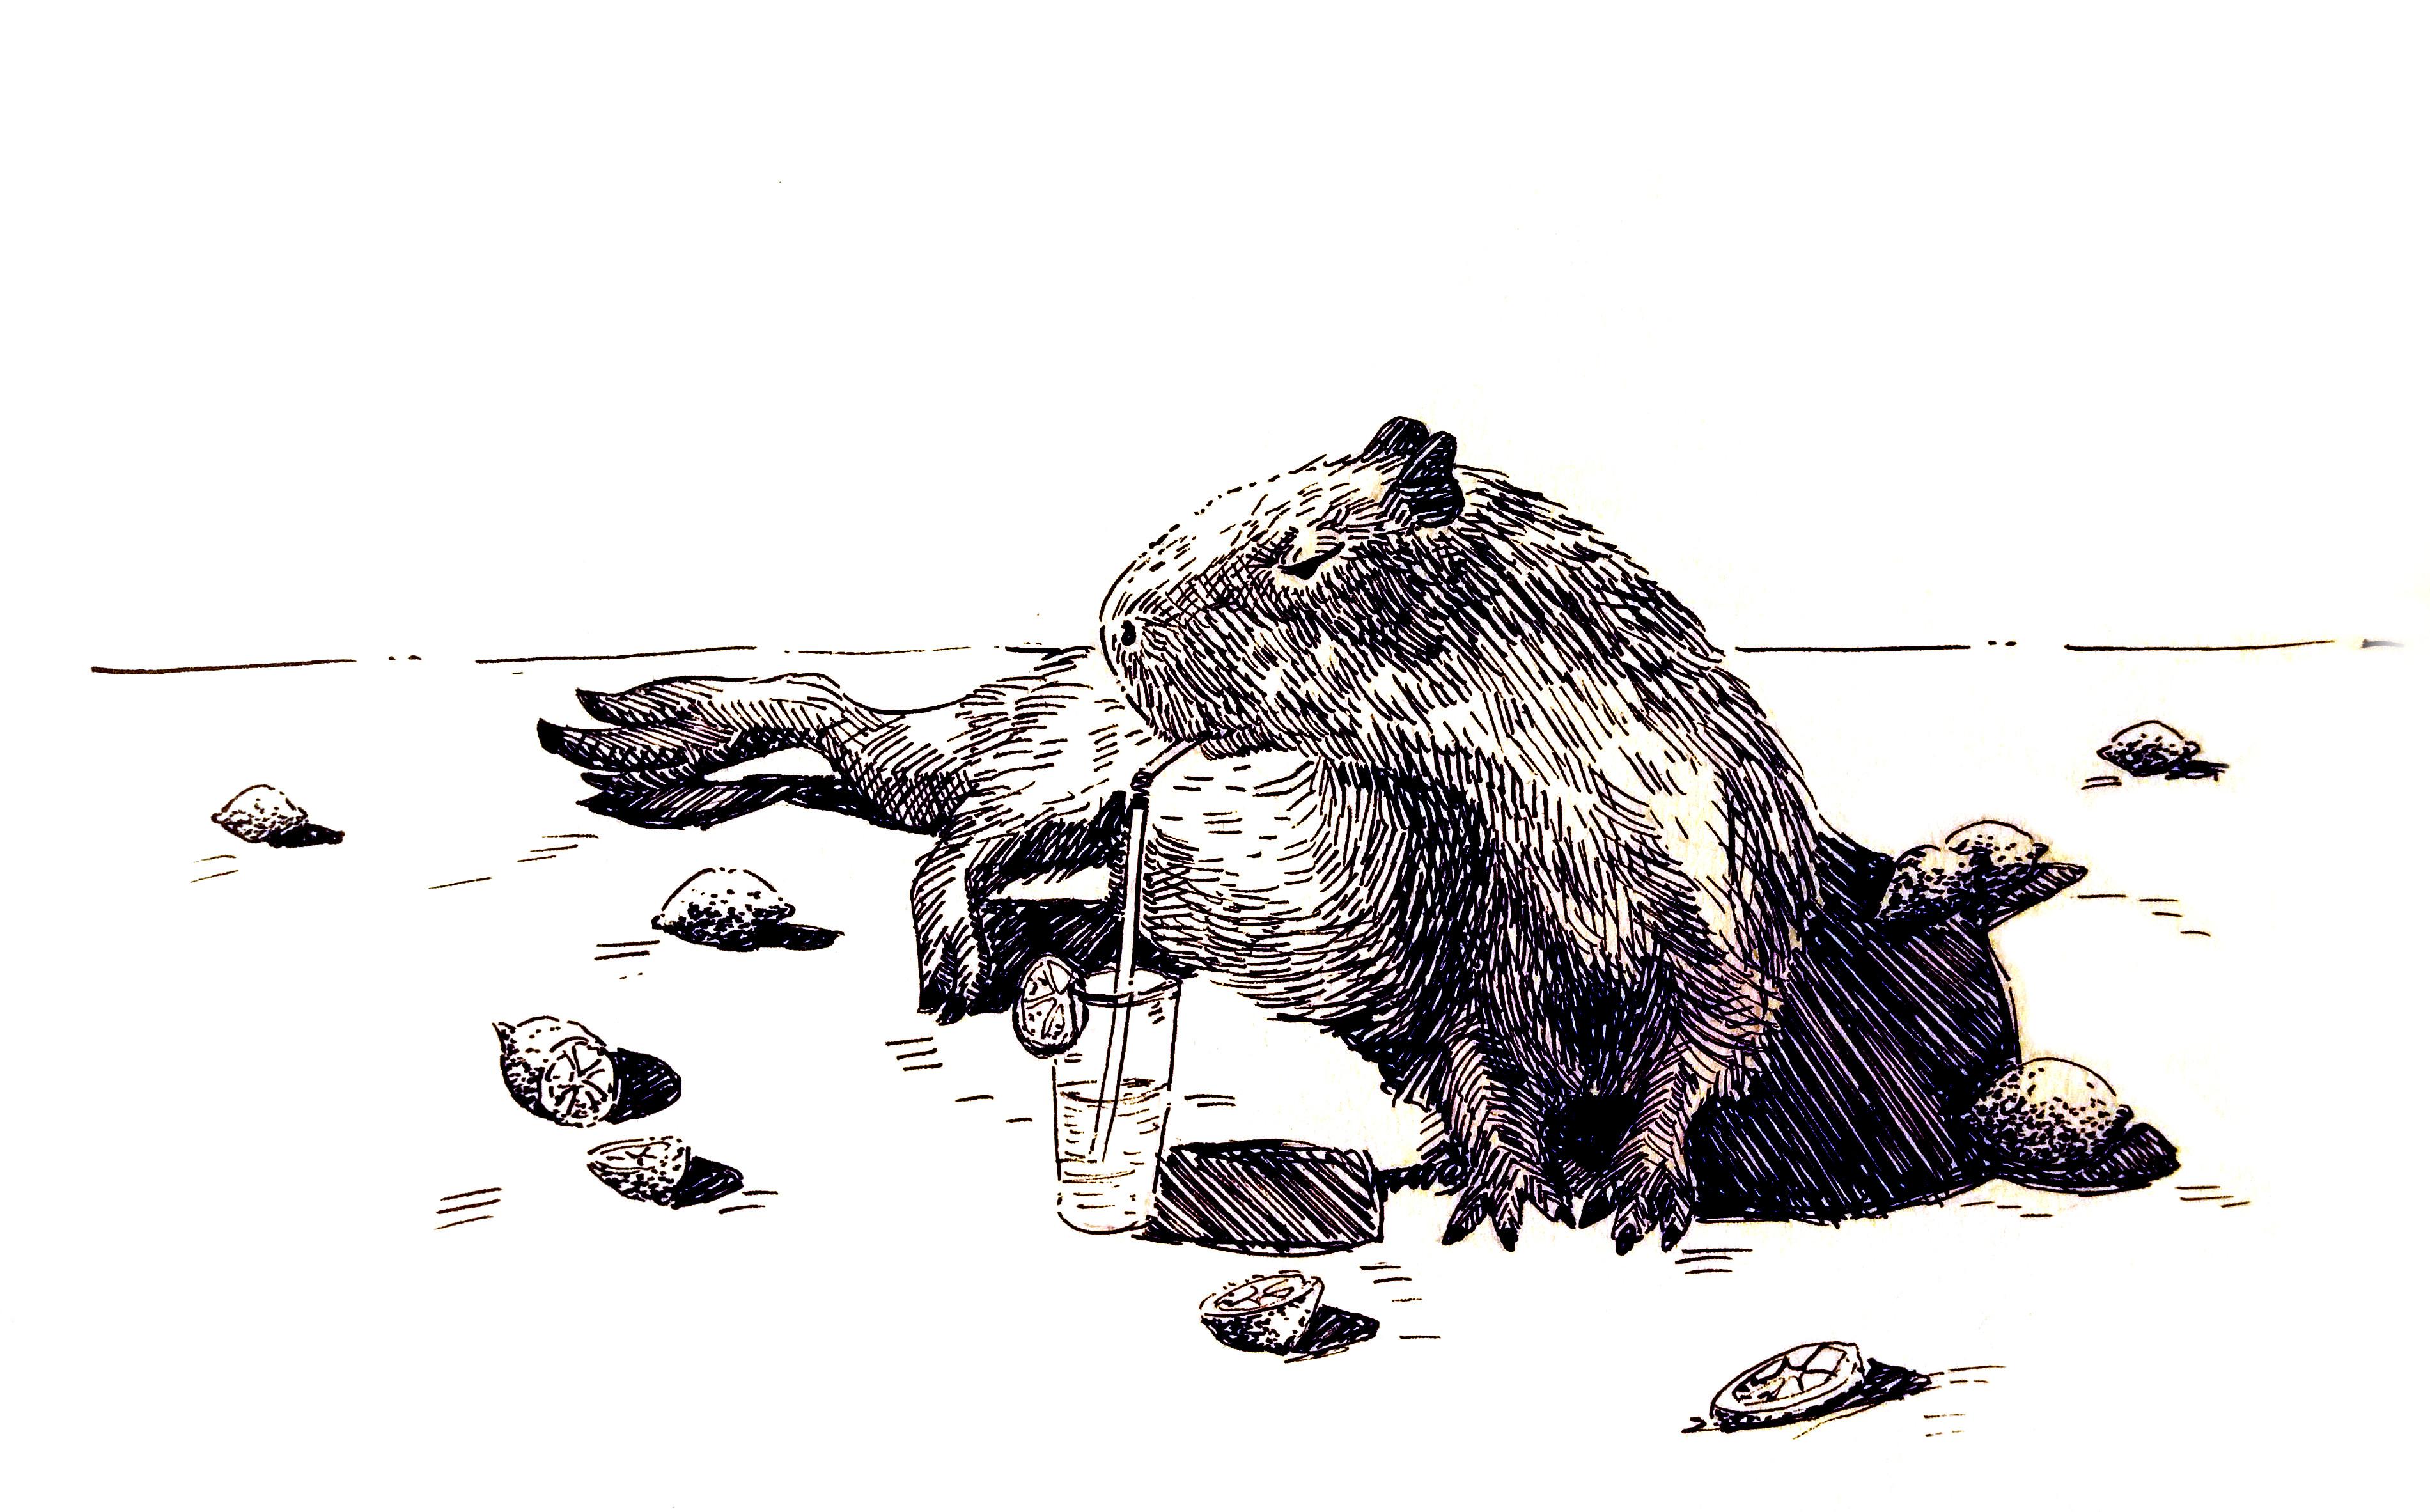 201220-inktober_capybara_lemonade_Melanie Franz